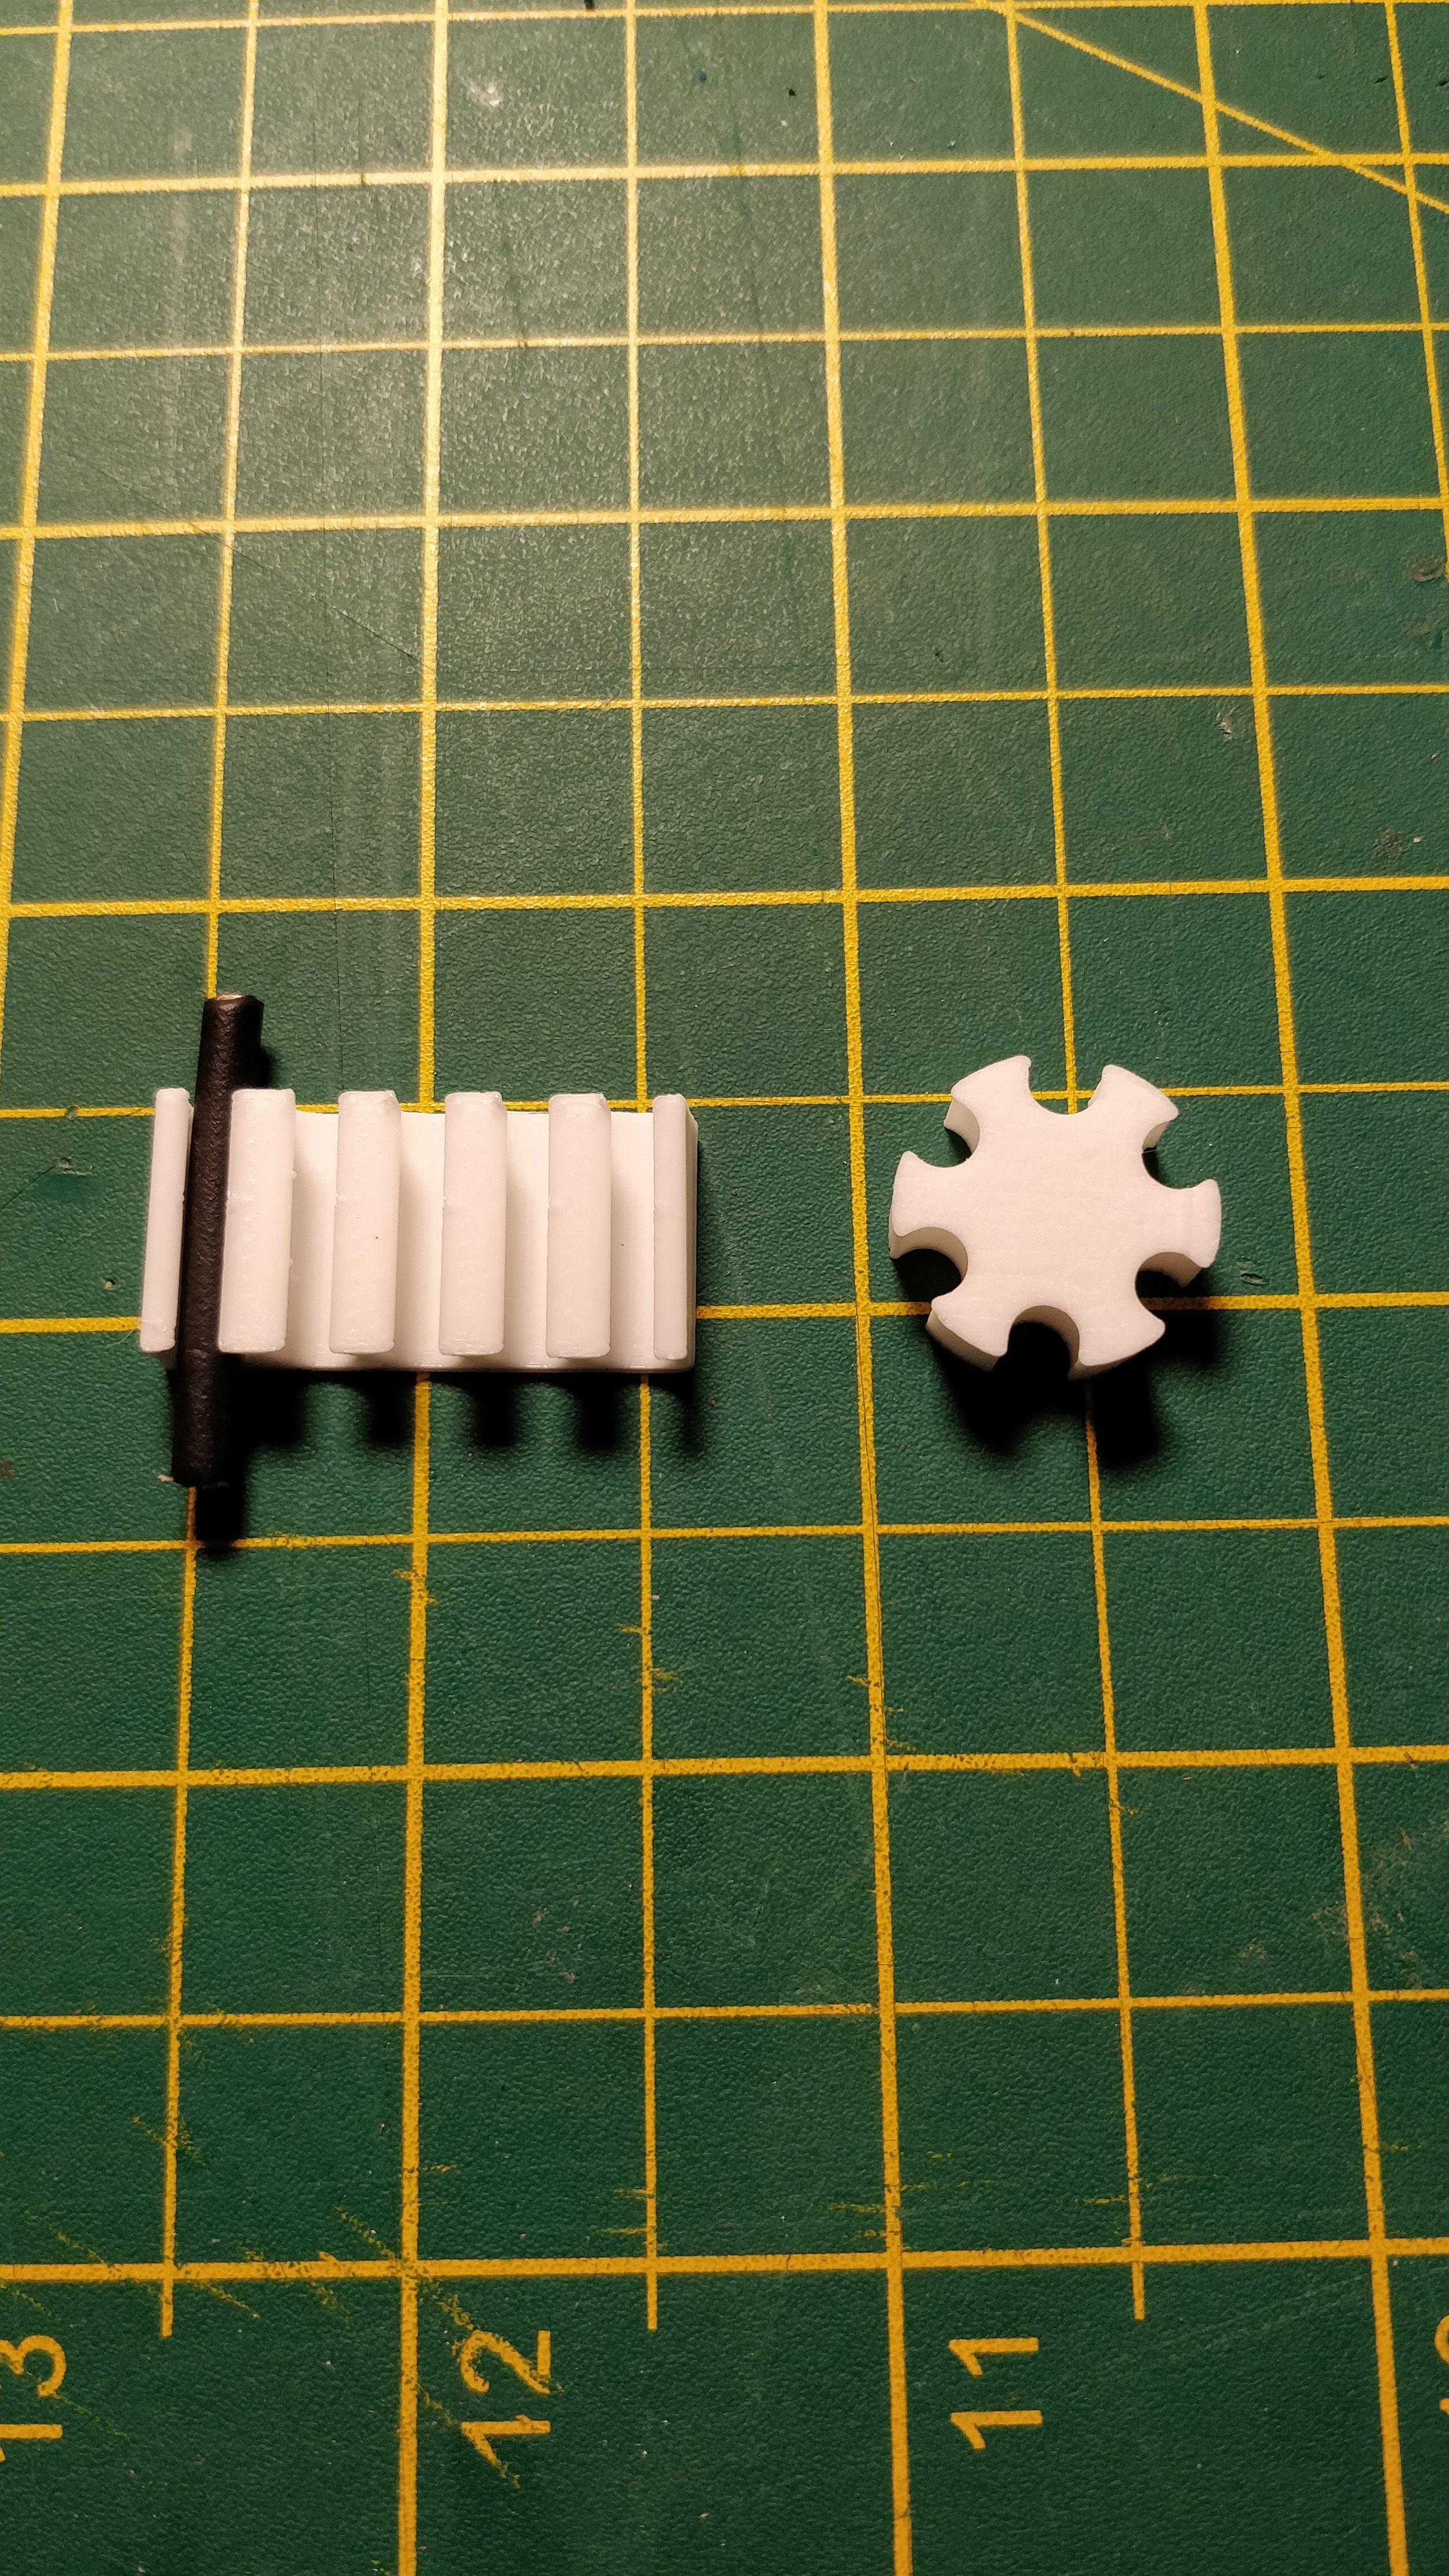 3D printed concepts